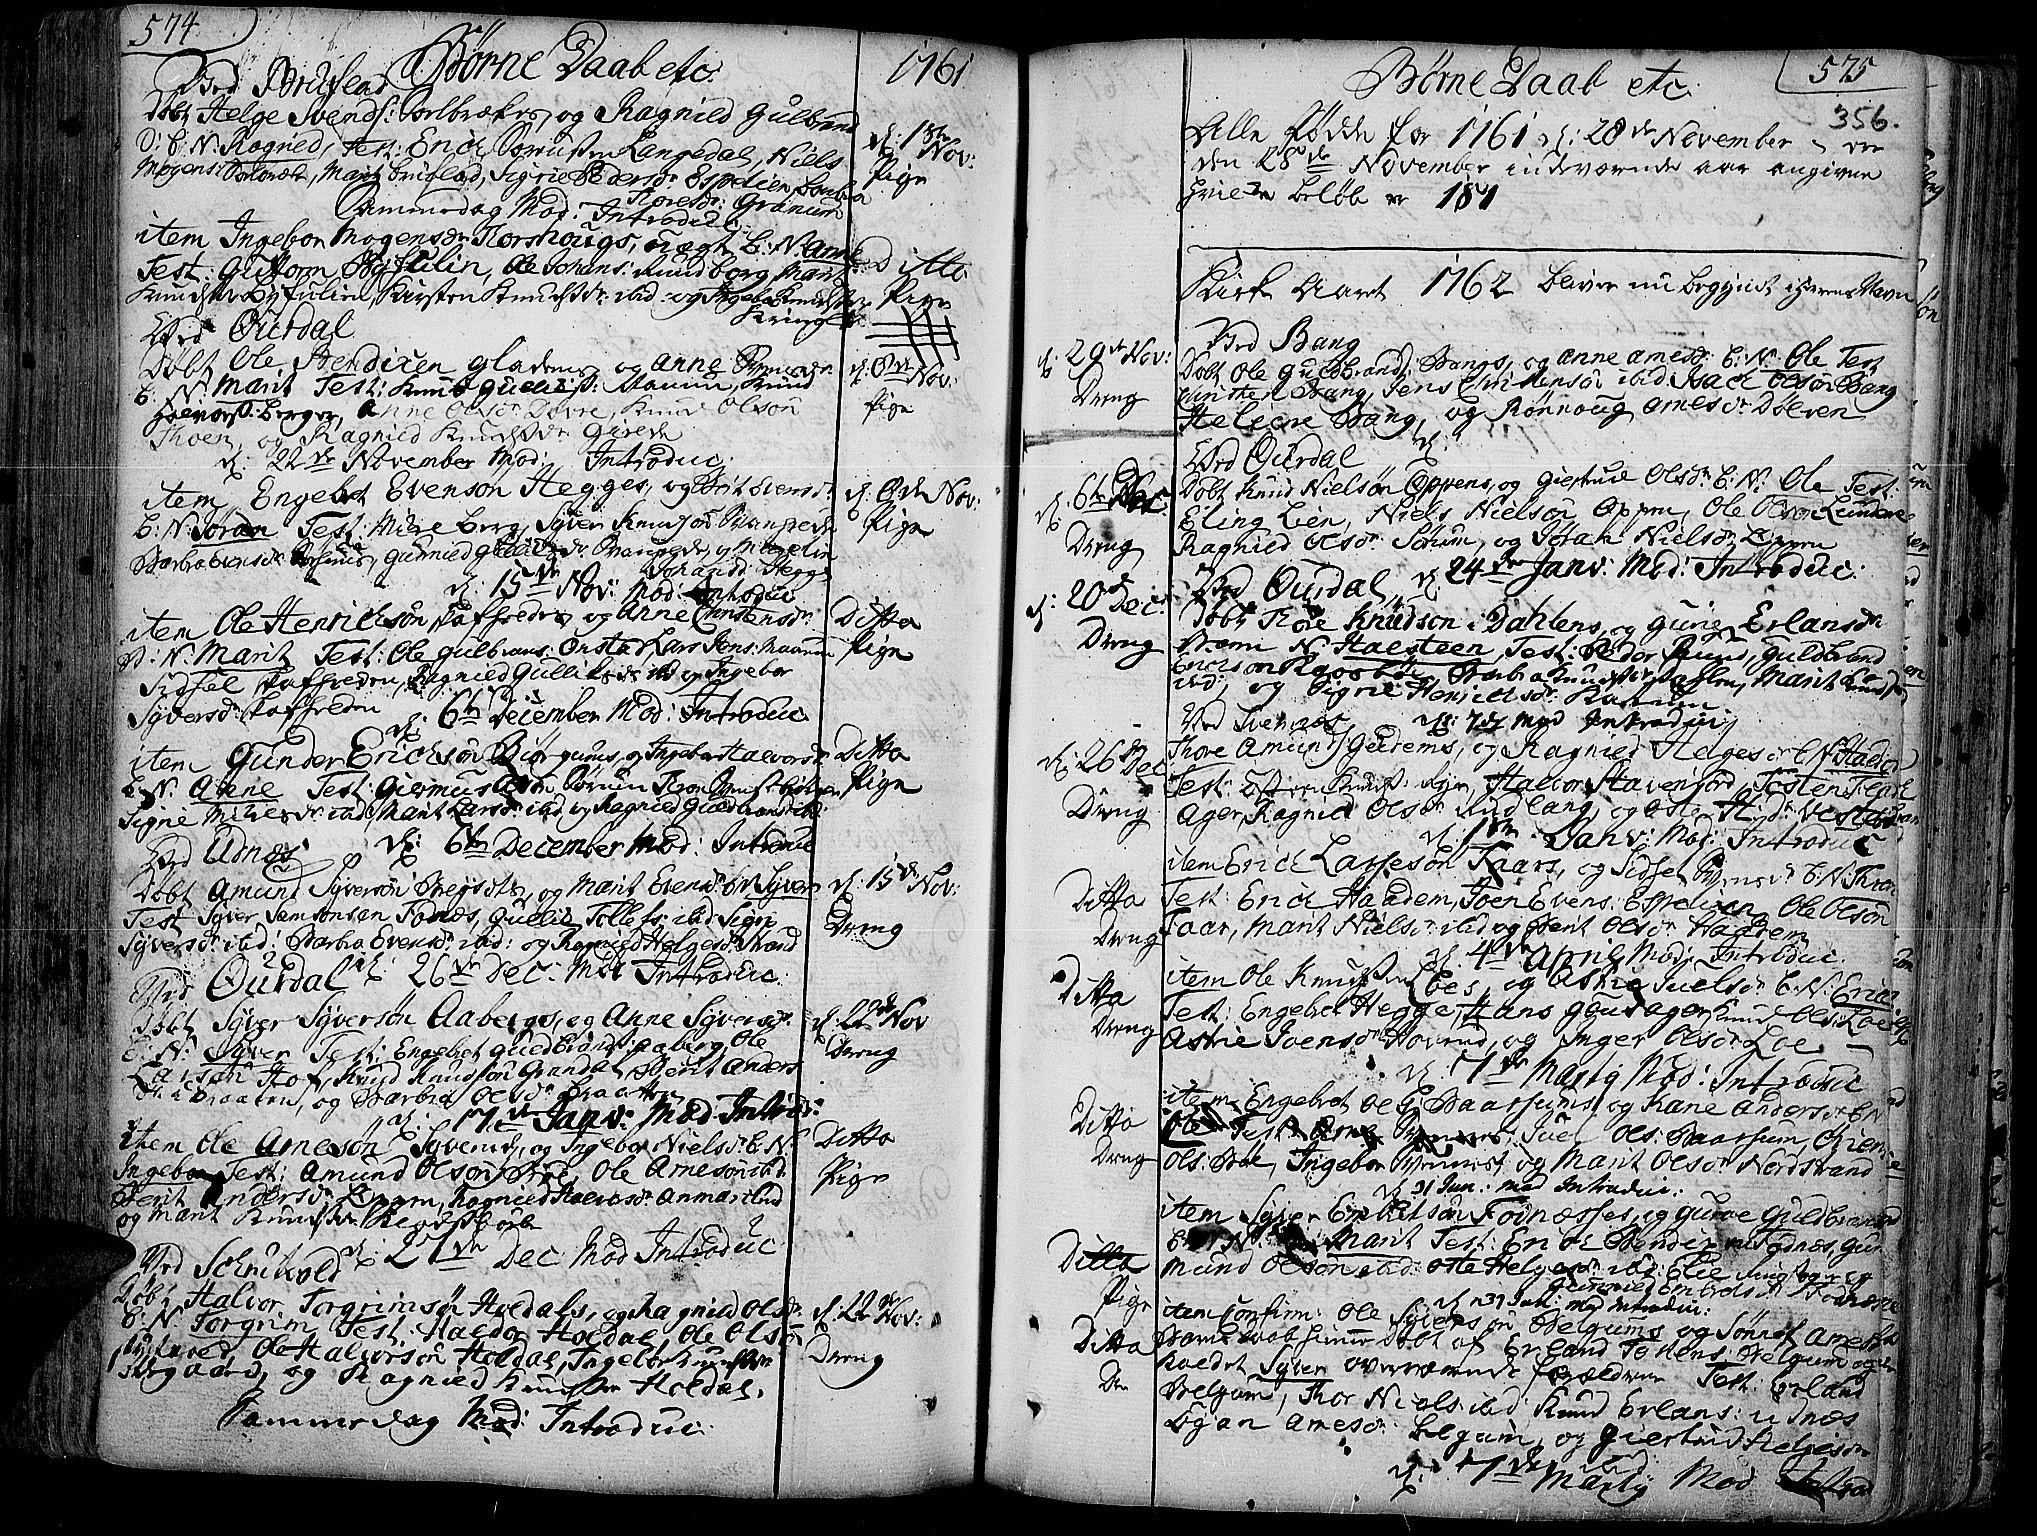 SAH, Aurdal prestekontor, Ministerialbok nr. 4, 1730-1762, s. 574-575